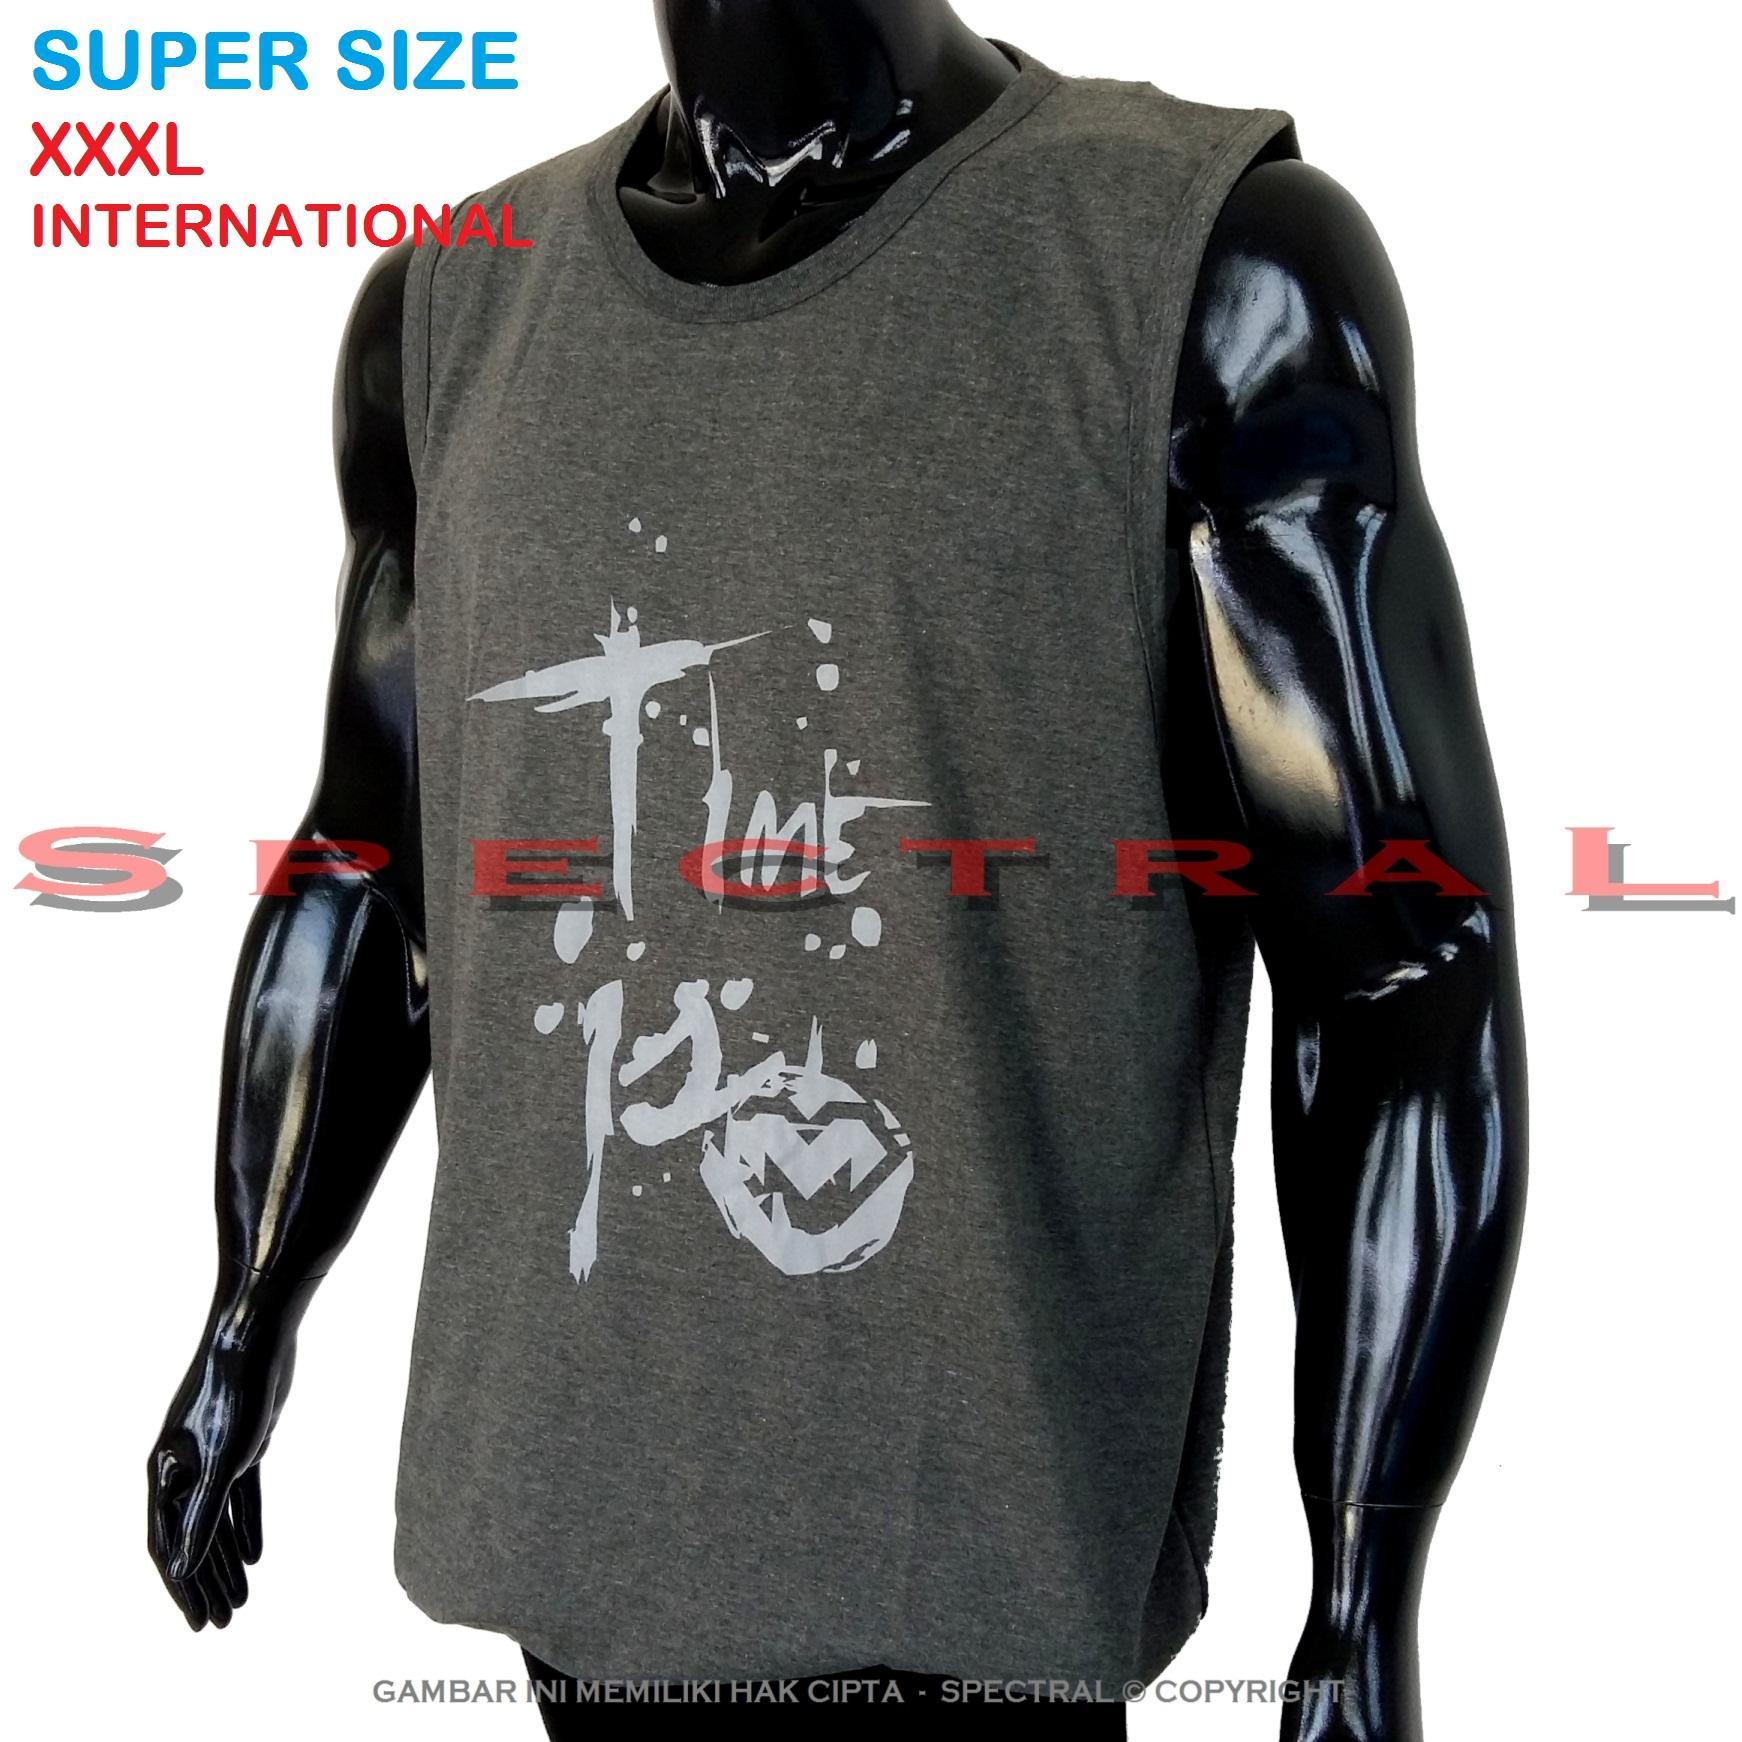 Spectral – 3XL SINGLET SUPER BIG SIZE XXXL 100% Cotton Combed Kaos Distro Jumbo T-Shirt Fashion Ukuran Besar Polos Celana Olahraga Atasan Pria Wanita Dewasa Bapak Orang Tua Muda Terbaru Gemuk Gendut Sport Bagus Keren Baju Cowo Cewe Pakaian 3L TIME